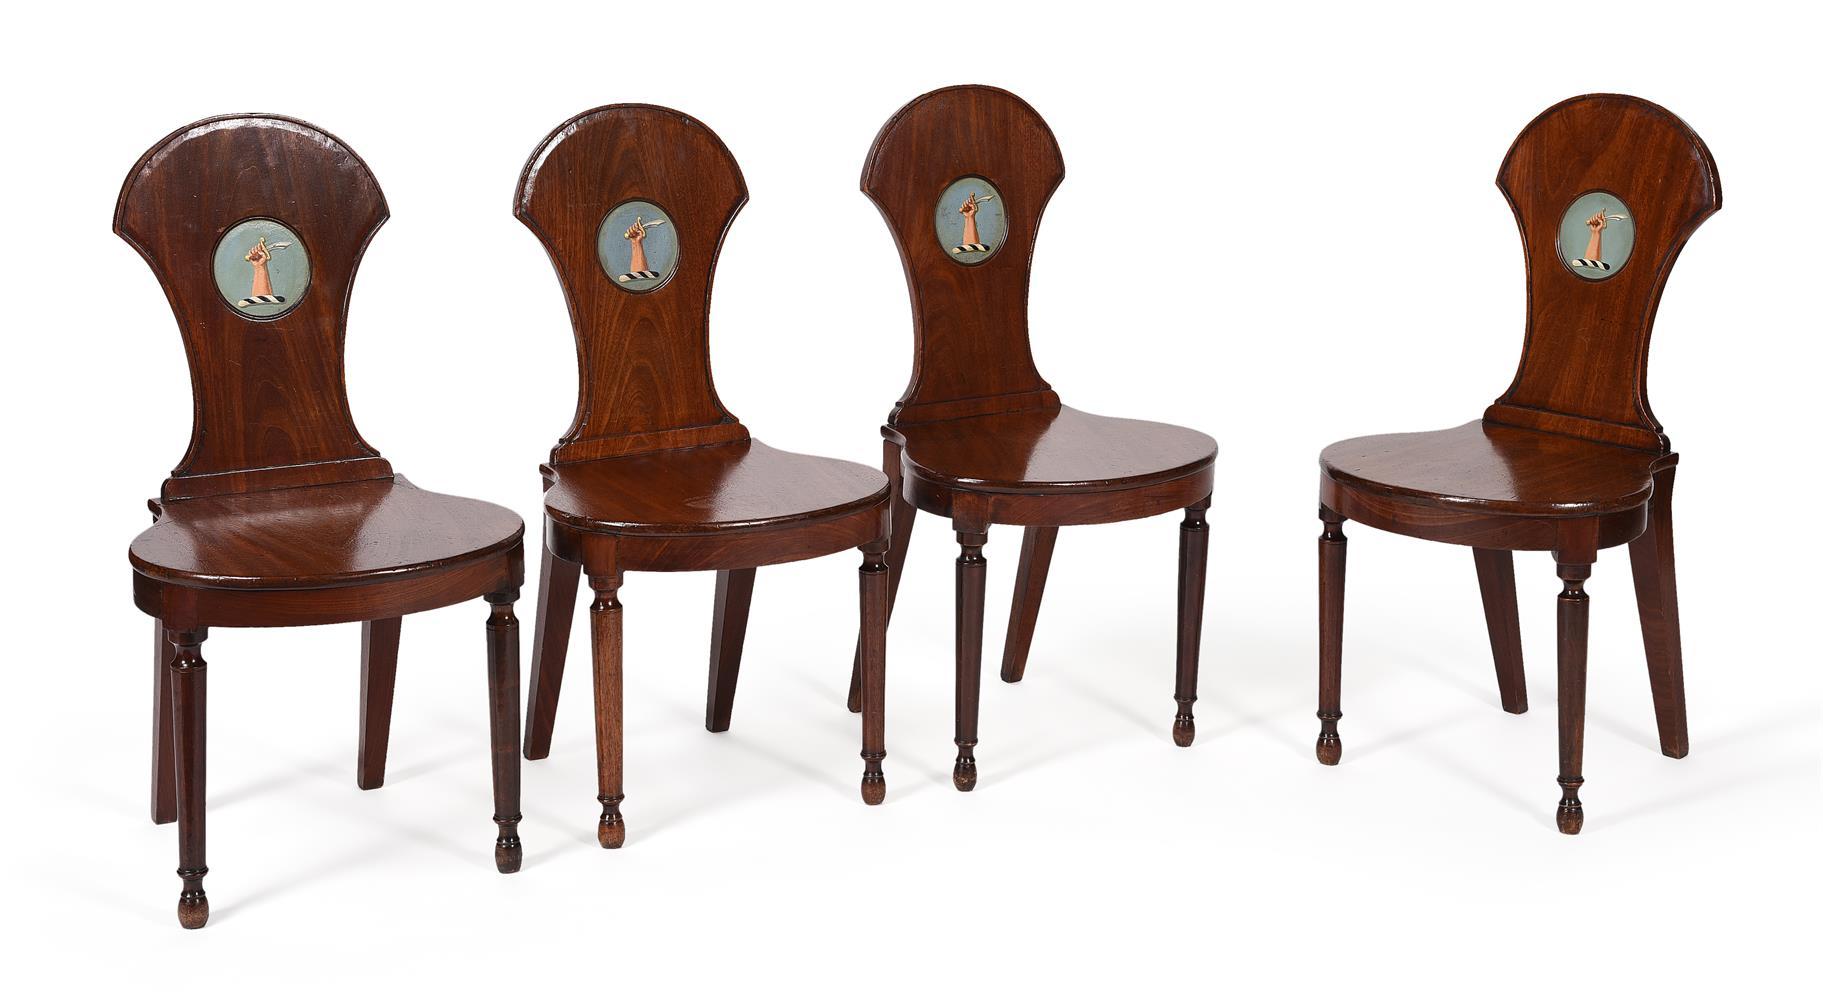 A SET OF FOUR LATE GEORGE III MAHOGANY HALL CHAIRS, CIRCA 1810